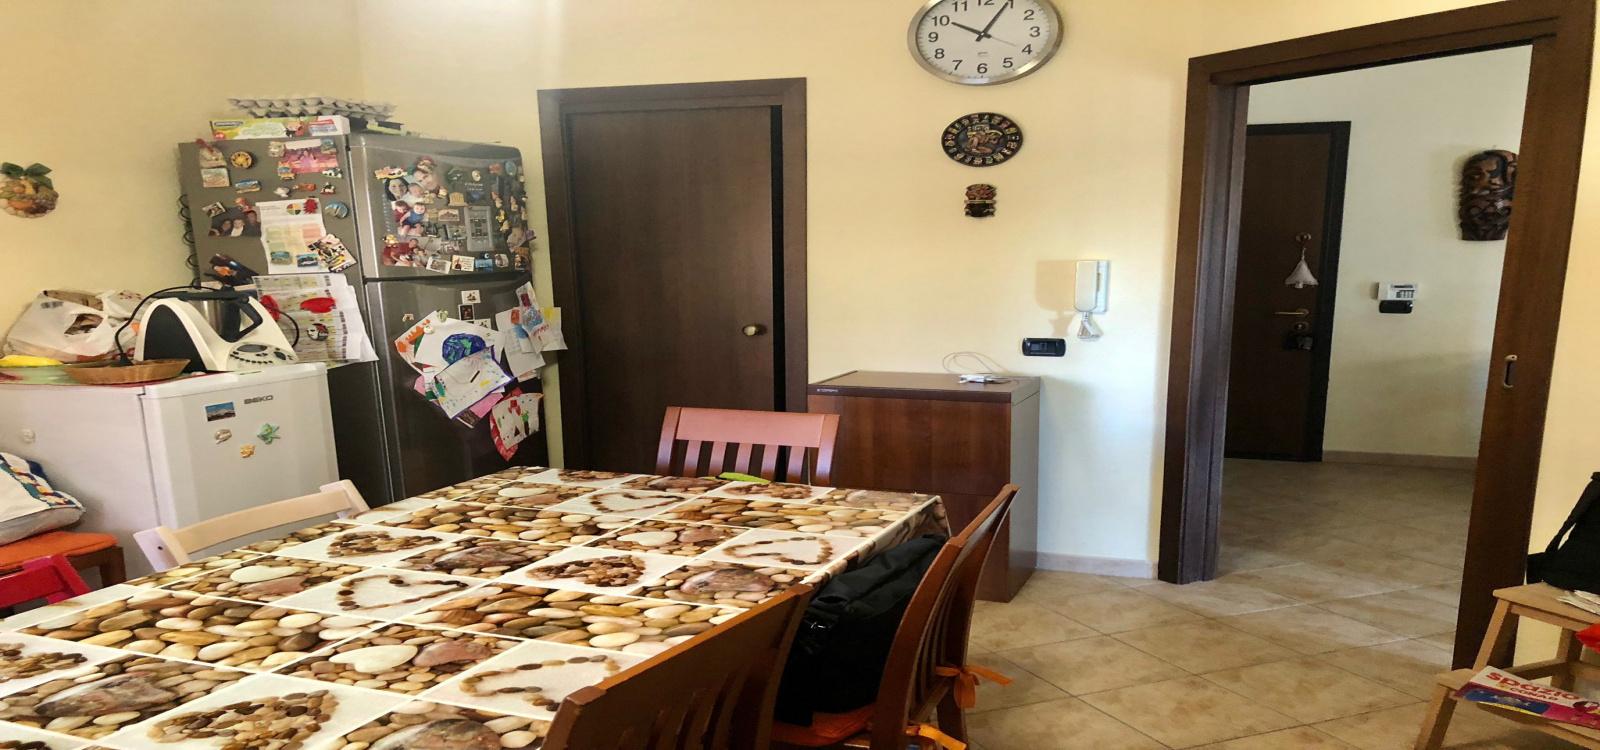 PIZZUTA,SIRACUSA,Appartamento,PIZZUTA,2430